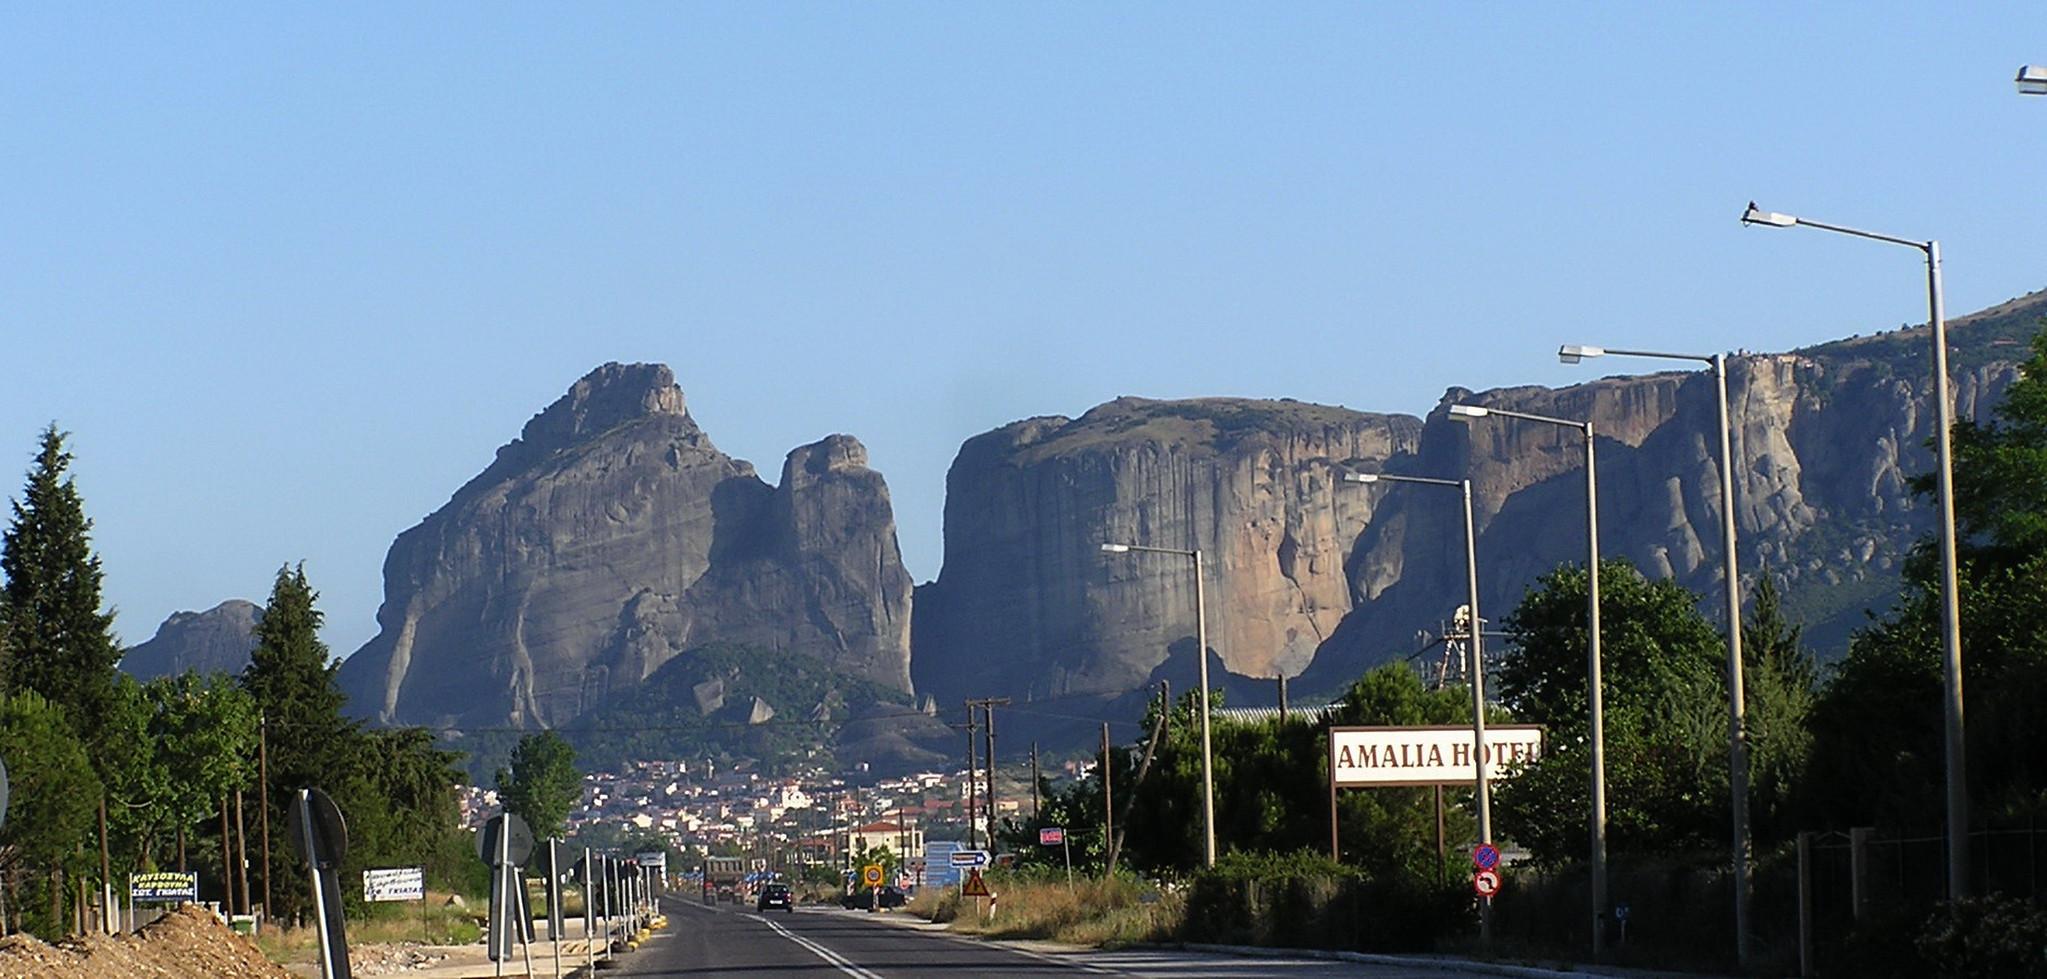 Grecia Llegada a Kalambaka en Meteora